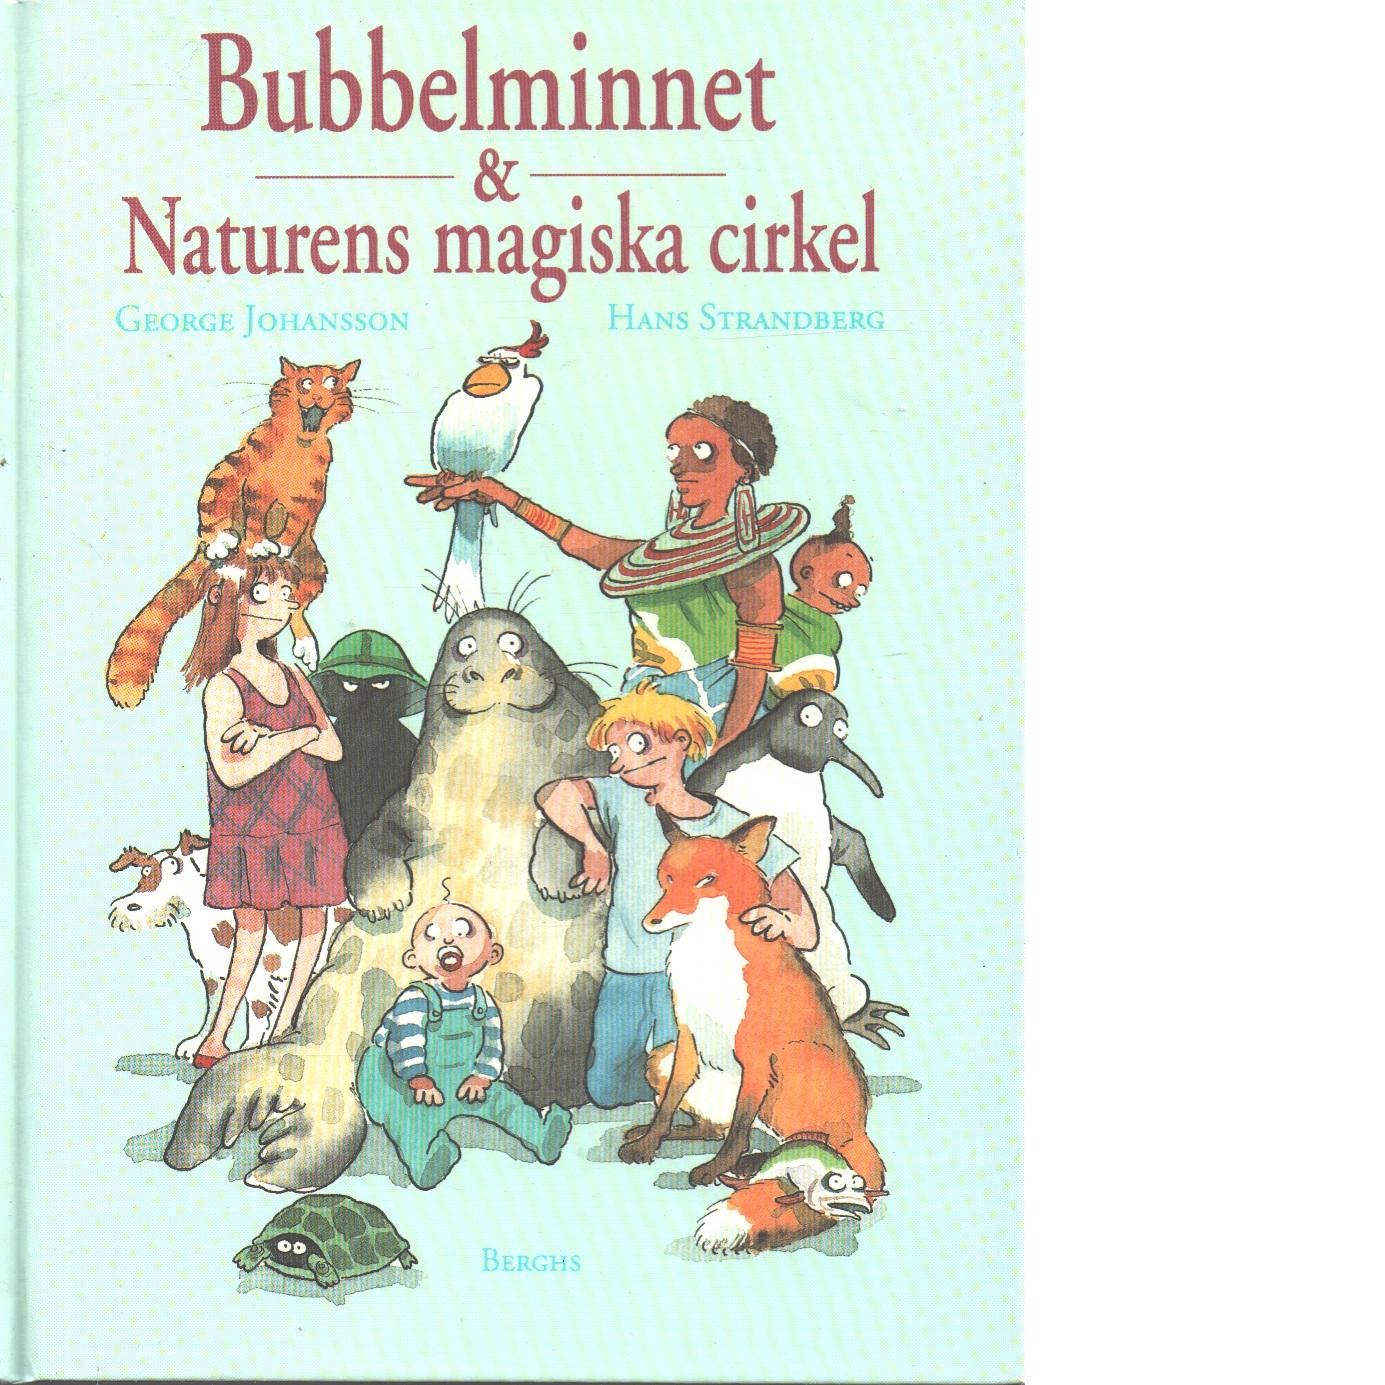 Bubbelminnet & Naturens magiska cirkel - Johansson, George